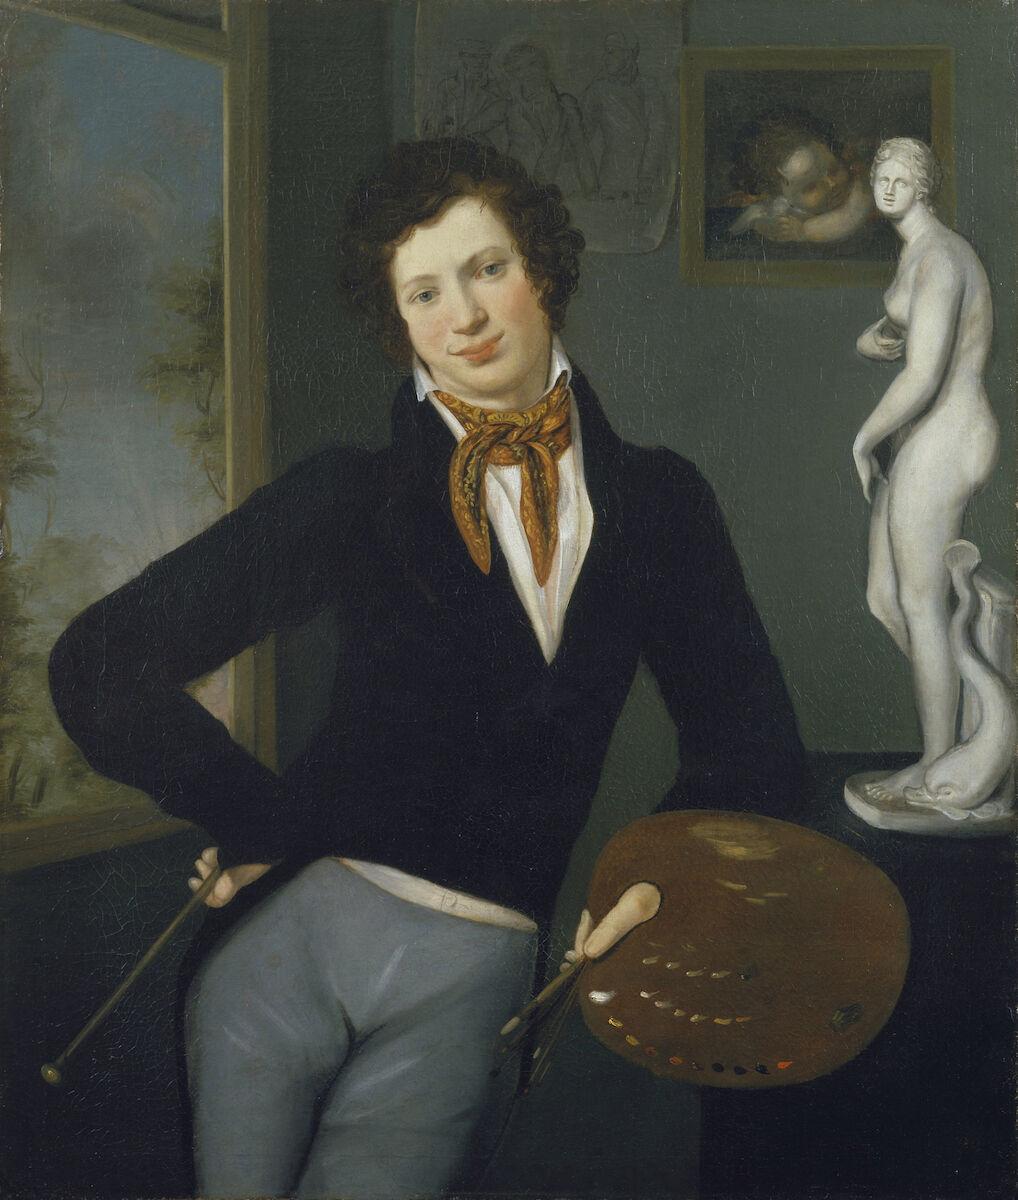 Moritz Daniel Oppenheim, Self-Portrait, 1814-16. Courtesy of the Jewish Museum.